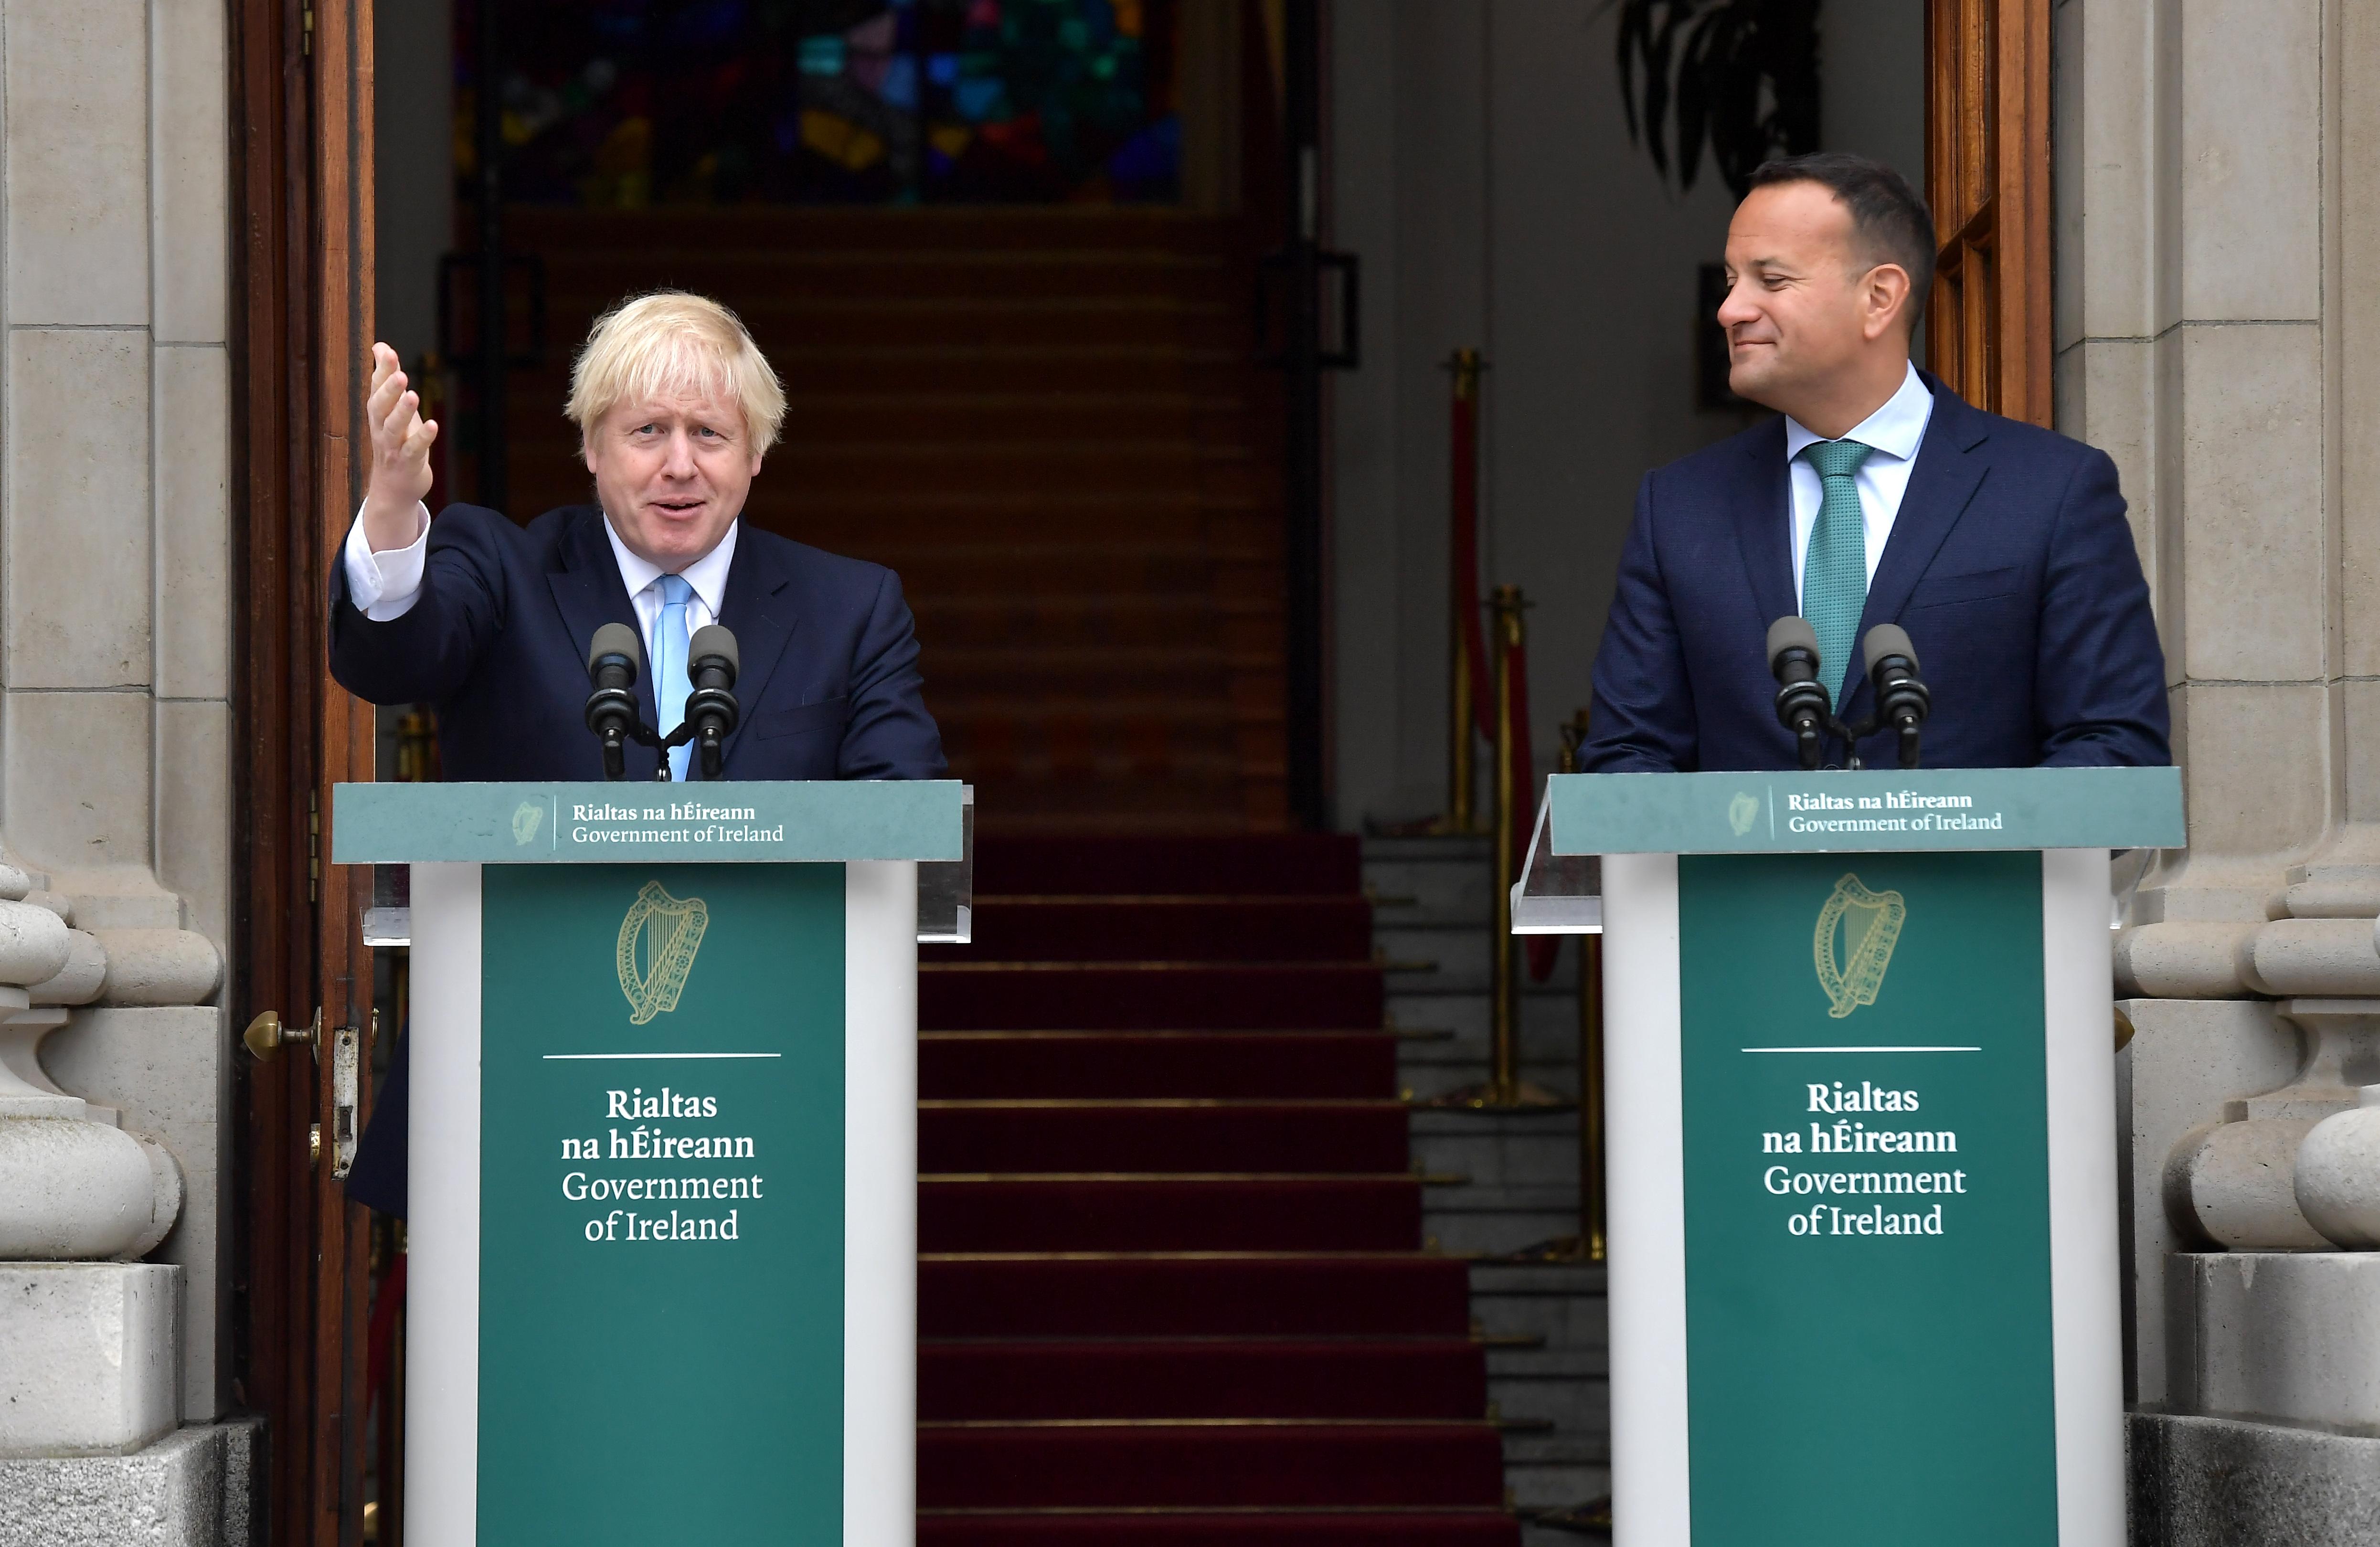 British Prime Minister Boris Johnson speaks to the media ahead of his meeting with Irish Taoiseach Leo Varadkar.